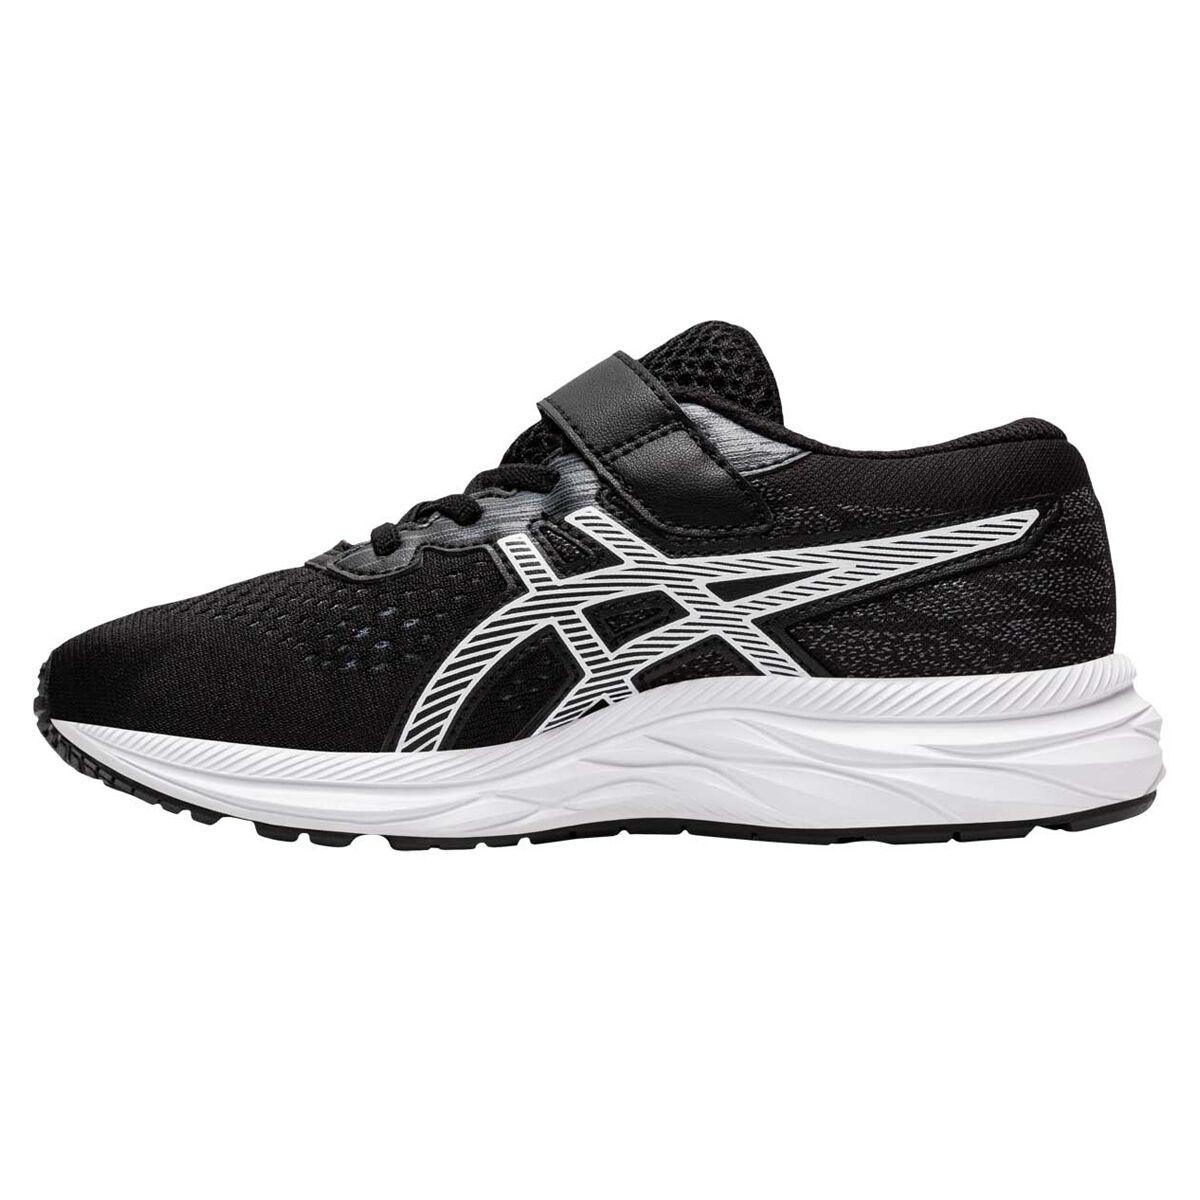 Asics GEL Excite 7 Kids Running Shoes